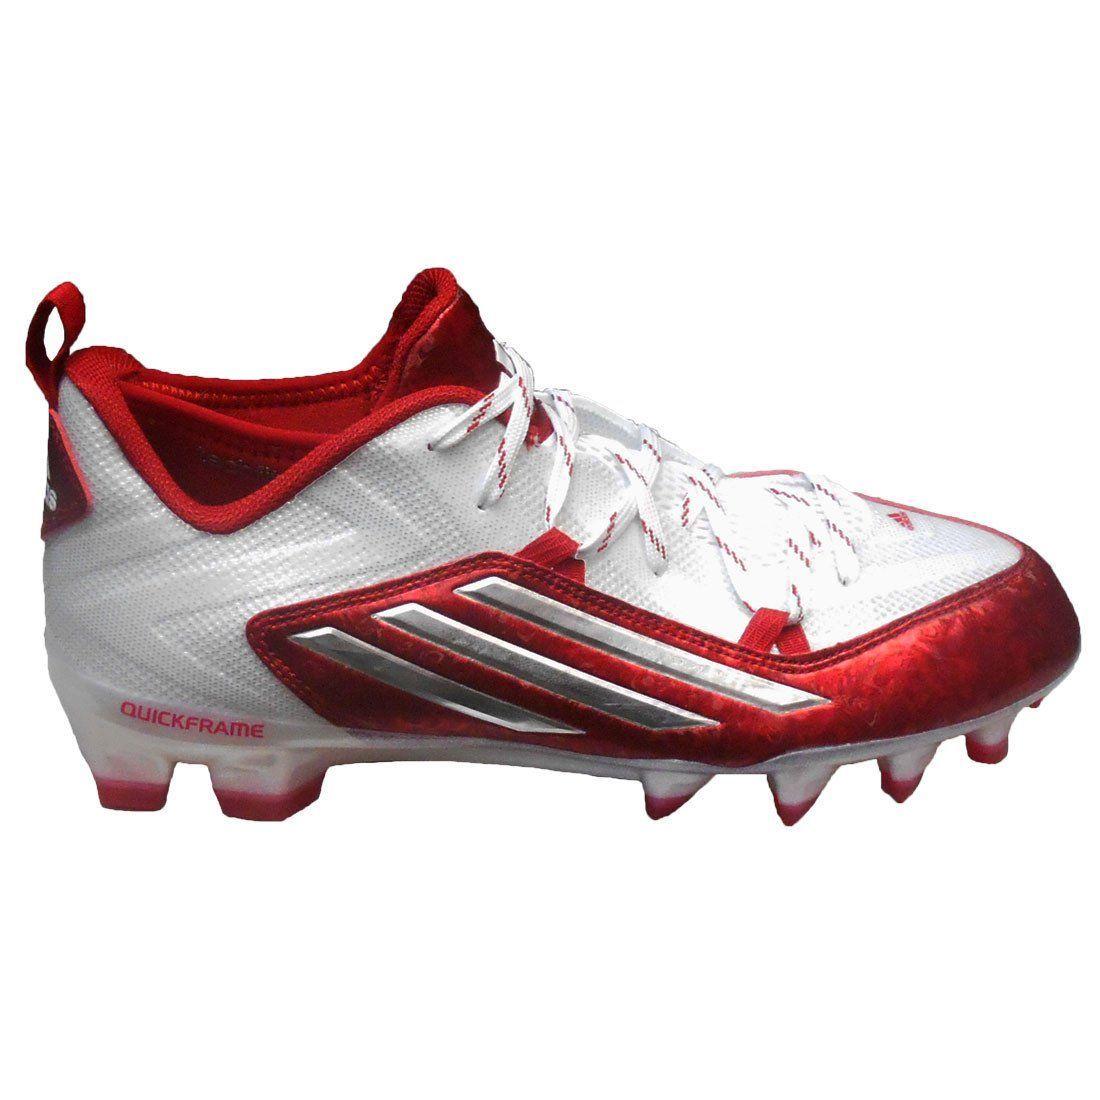 de3813af51b adidas Crazyquick 2.0 Football Cleats